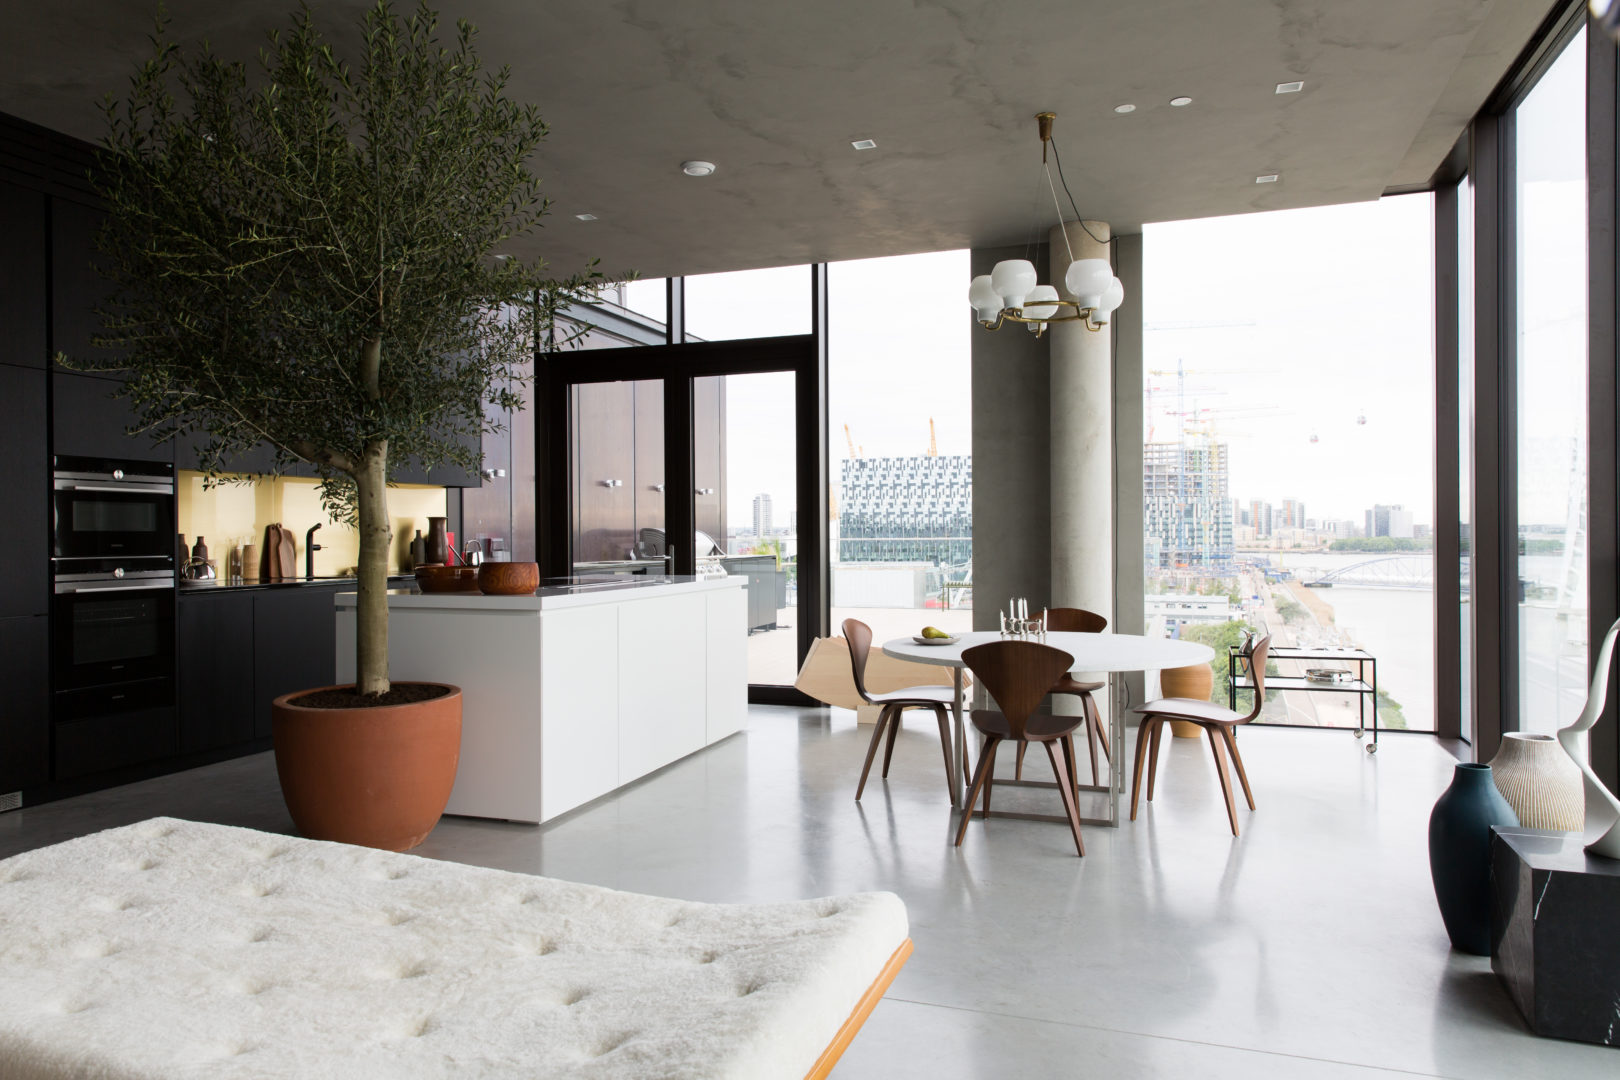 Cereal Home London - COCO LAPINE DESIGNCOCO LAPINE DESIGN